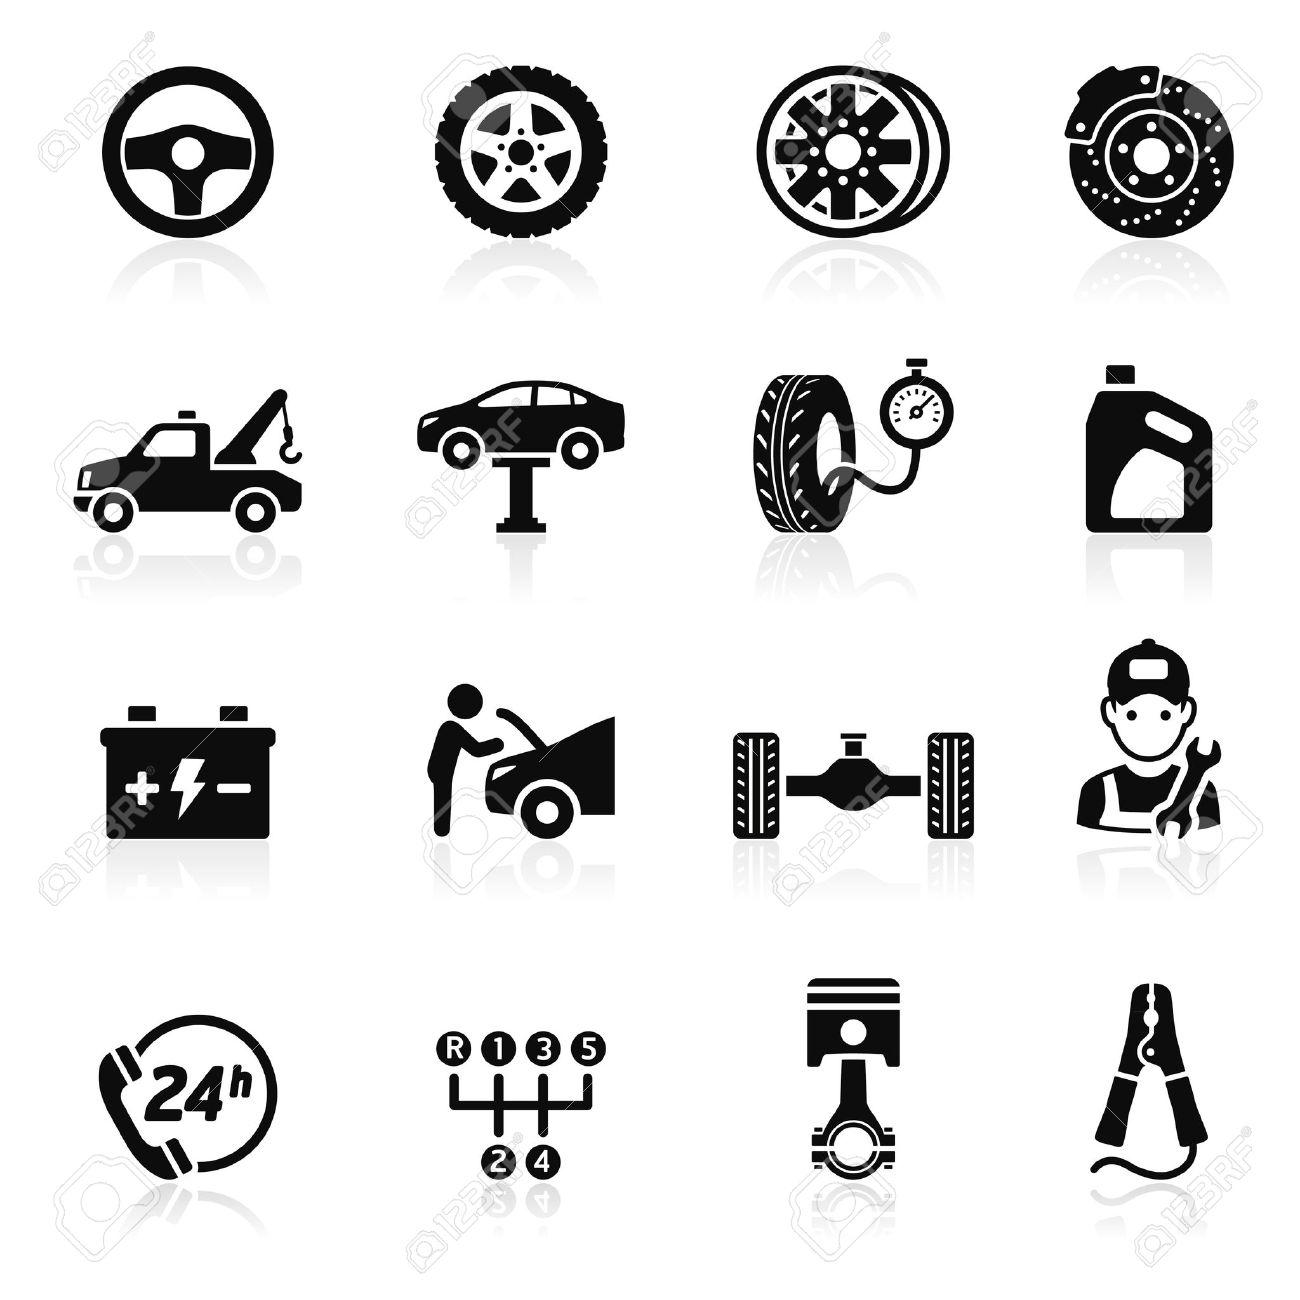 Car service maintenance icon - 17098673